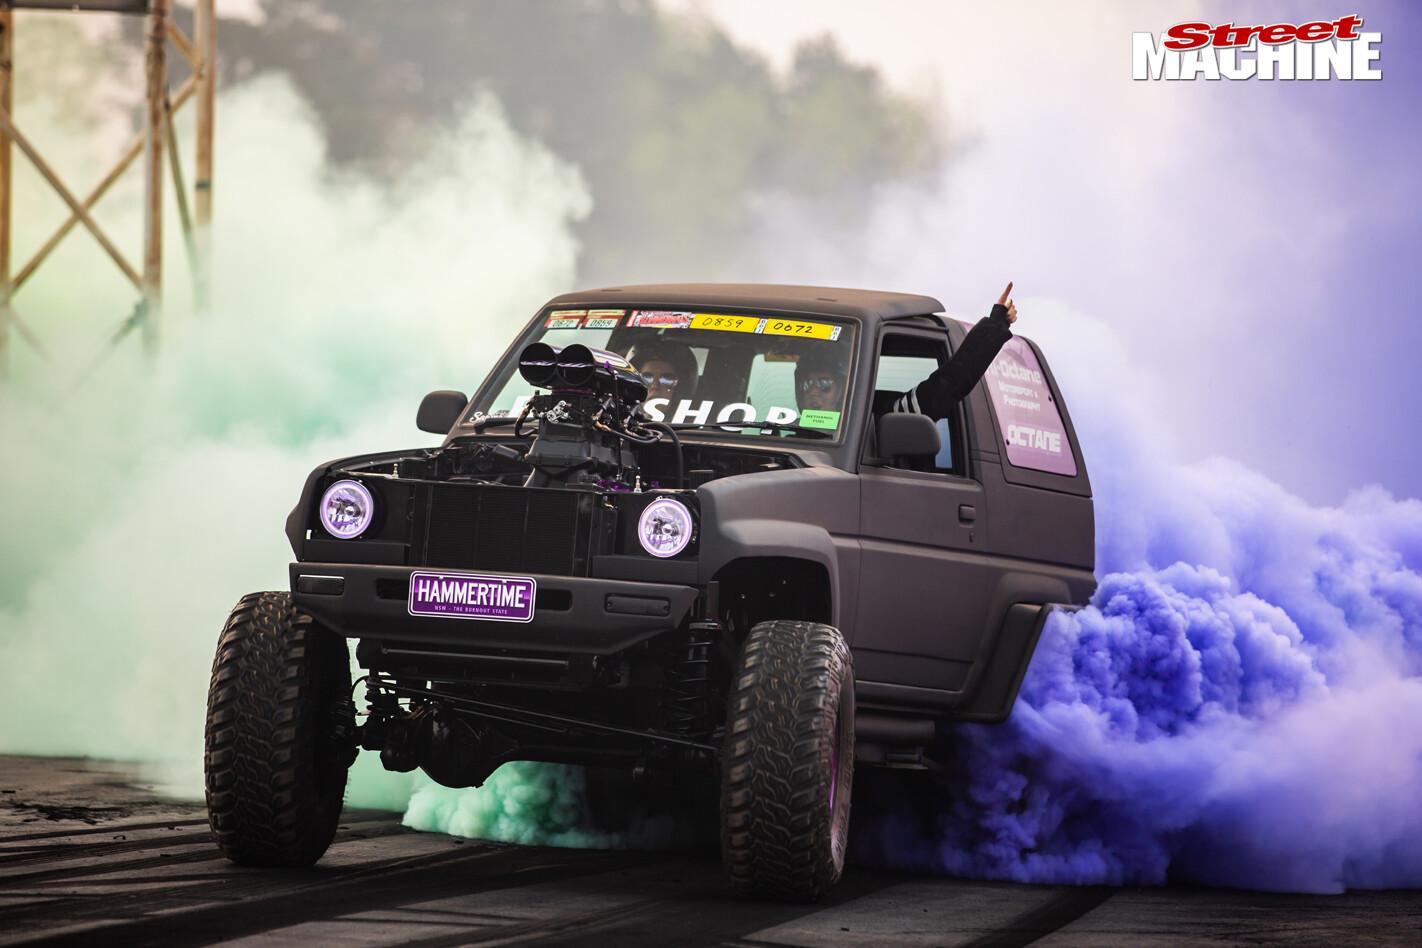 HAMMERTIME burnout Daihatsu 4wd